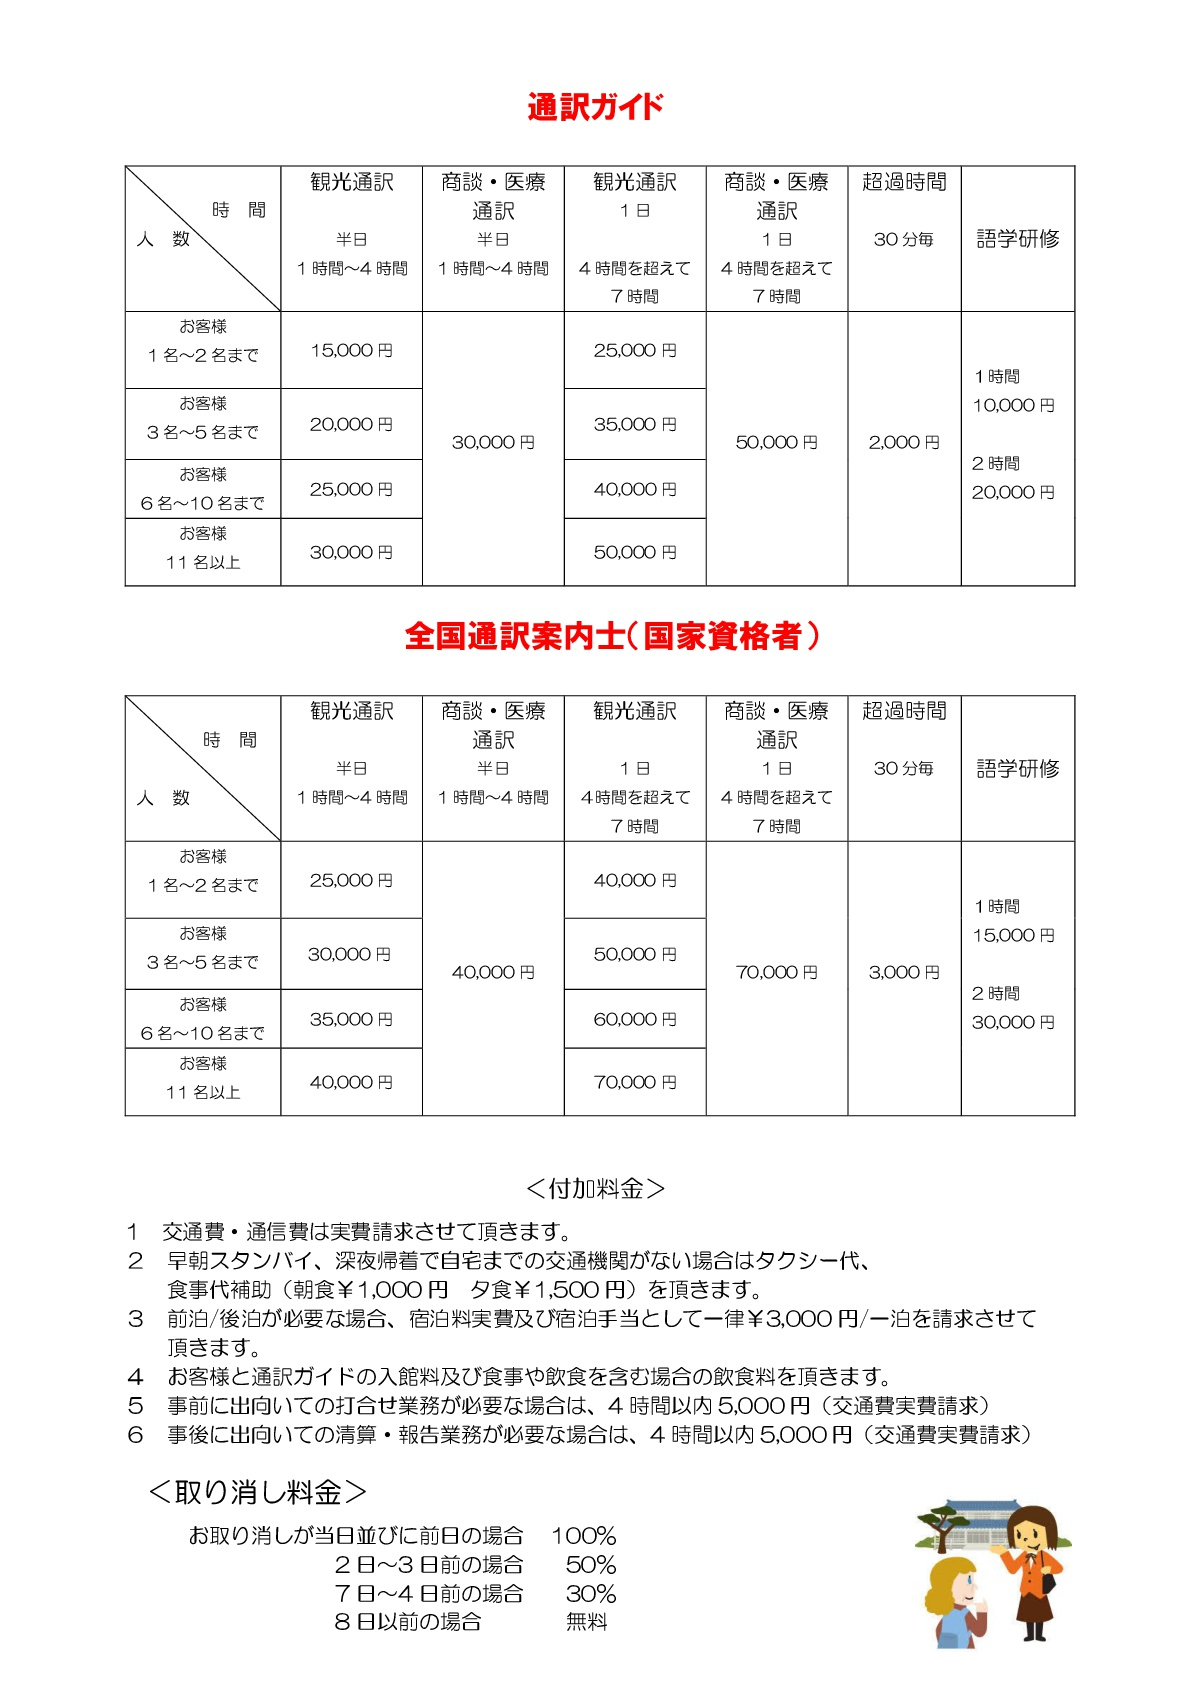 tuuyaku2-001 (1).jpg